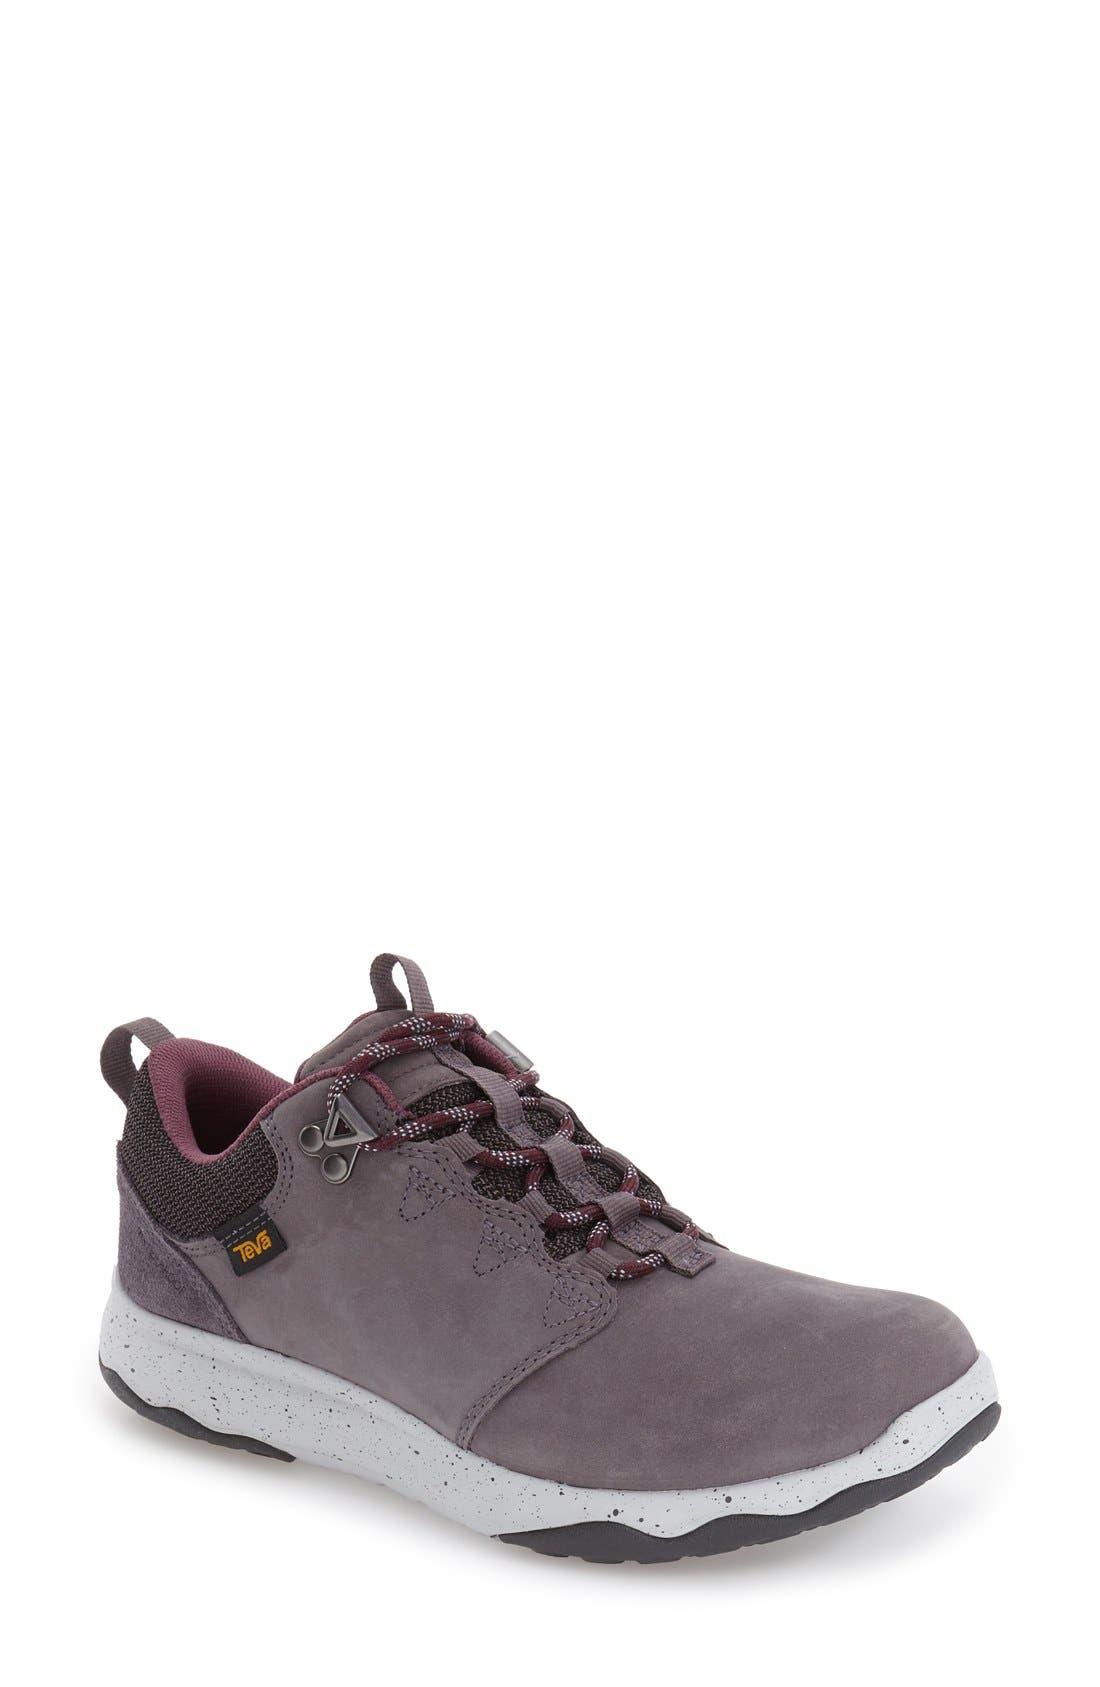 'Arrowood Lux' Waterproof Sneaker,                             Main thumbnail 1, color,                             025